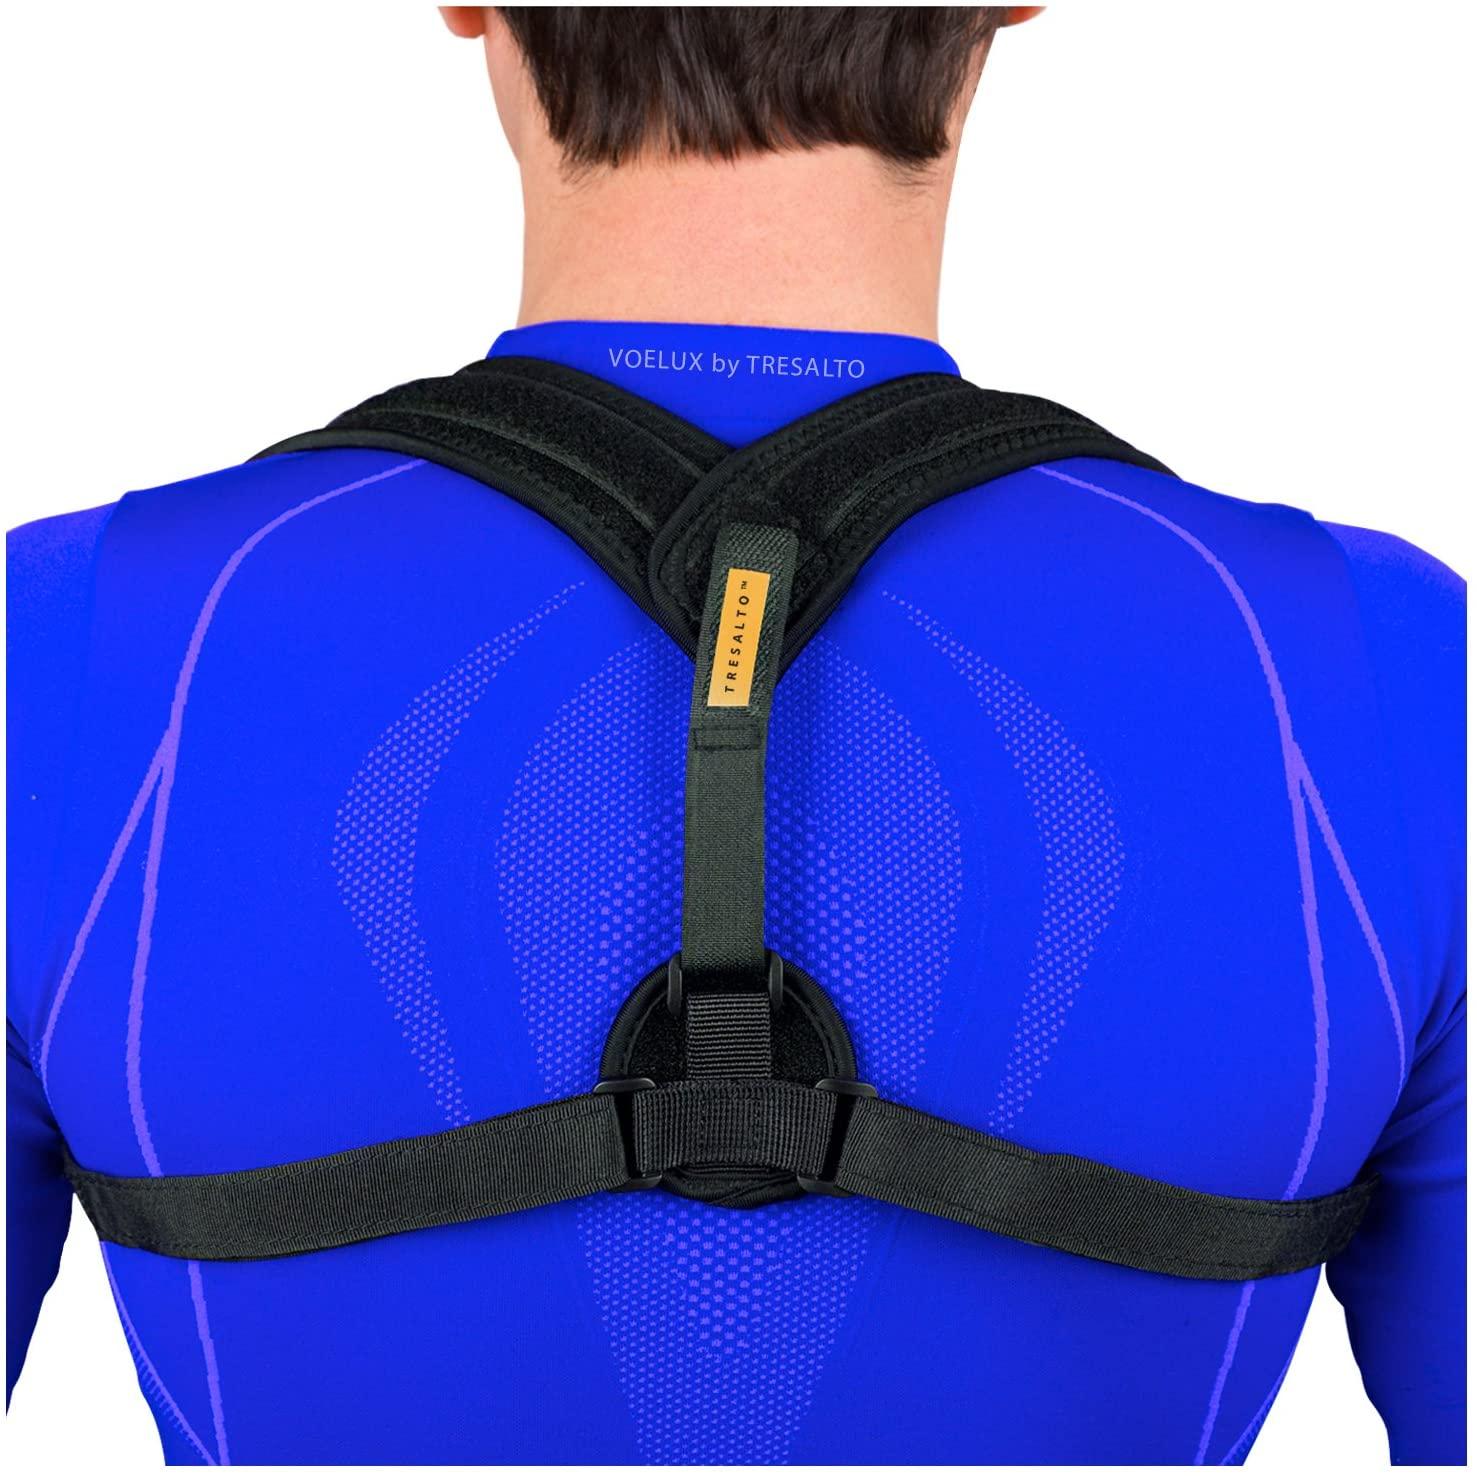 Tresalto Posture Corrector Clavicle Support Brace for Men and Women Upper Back